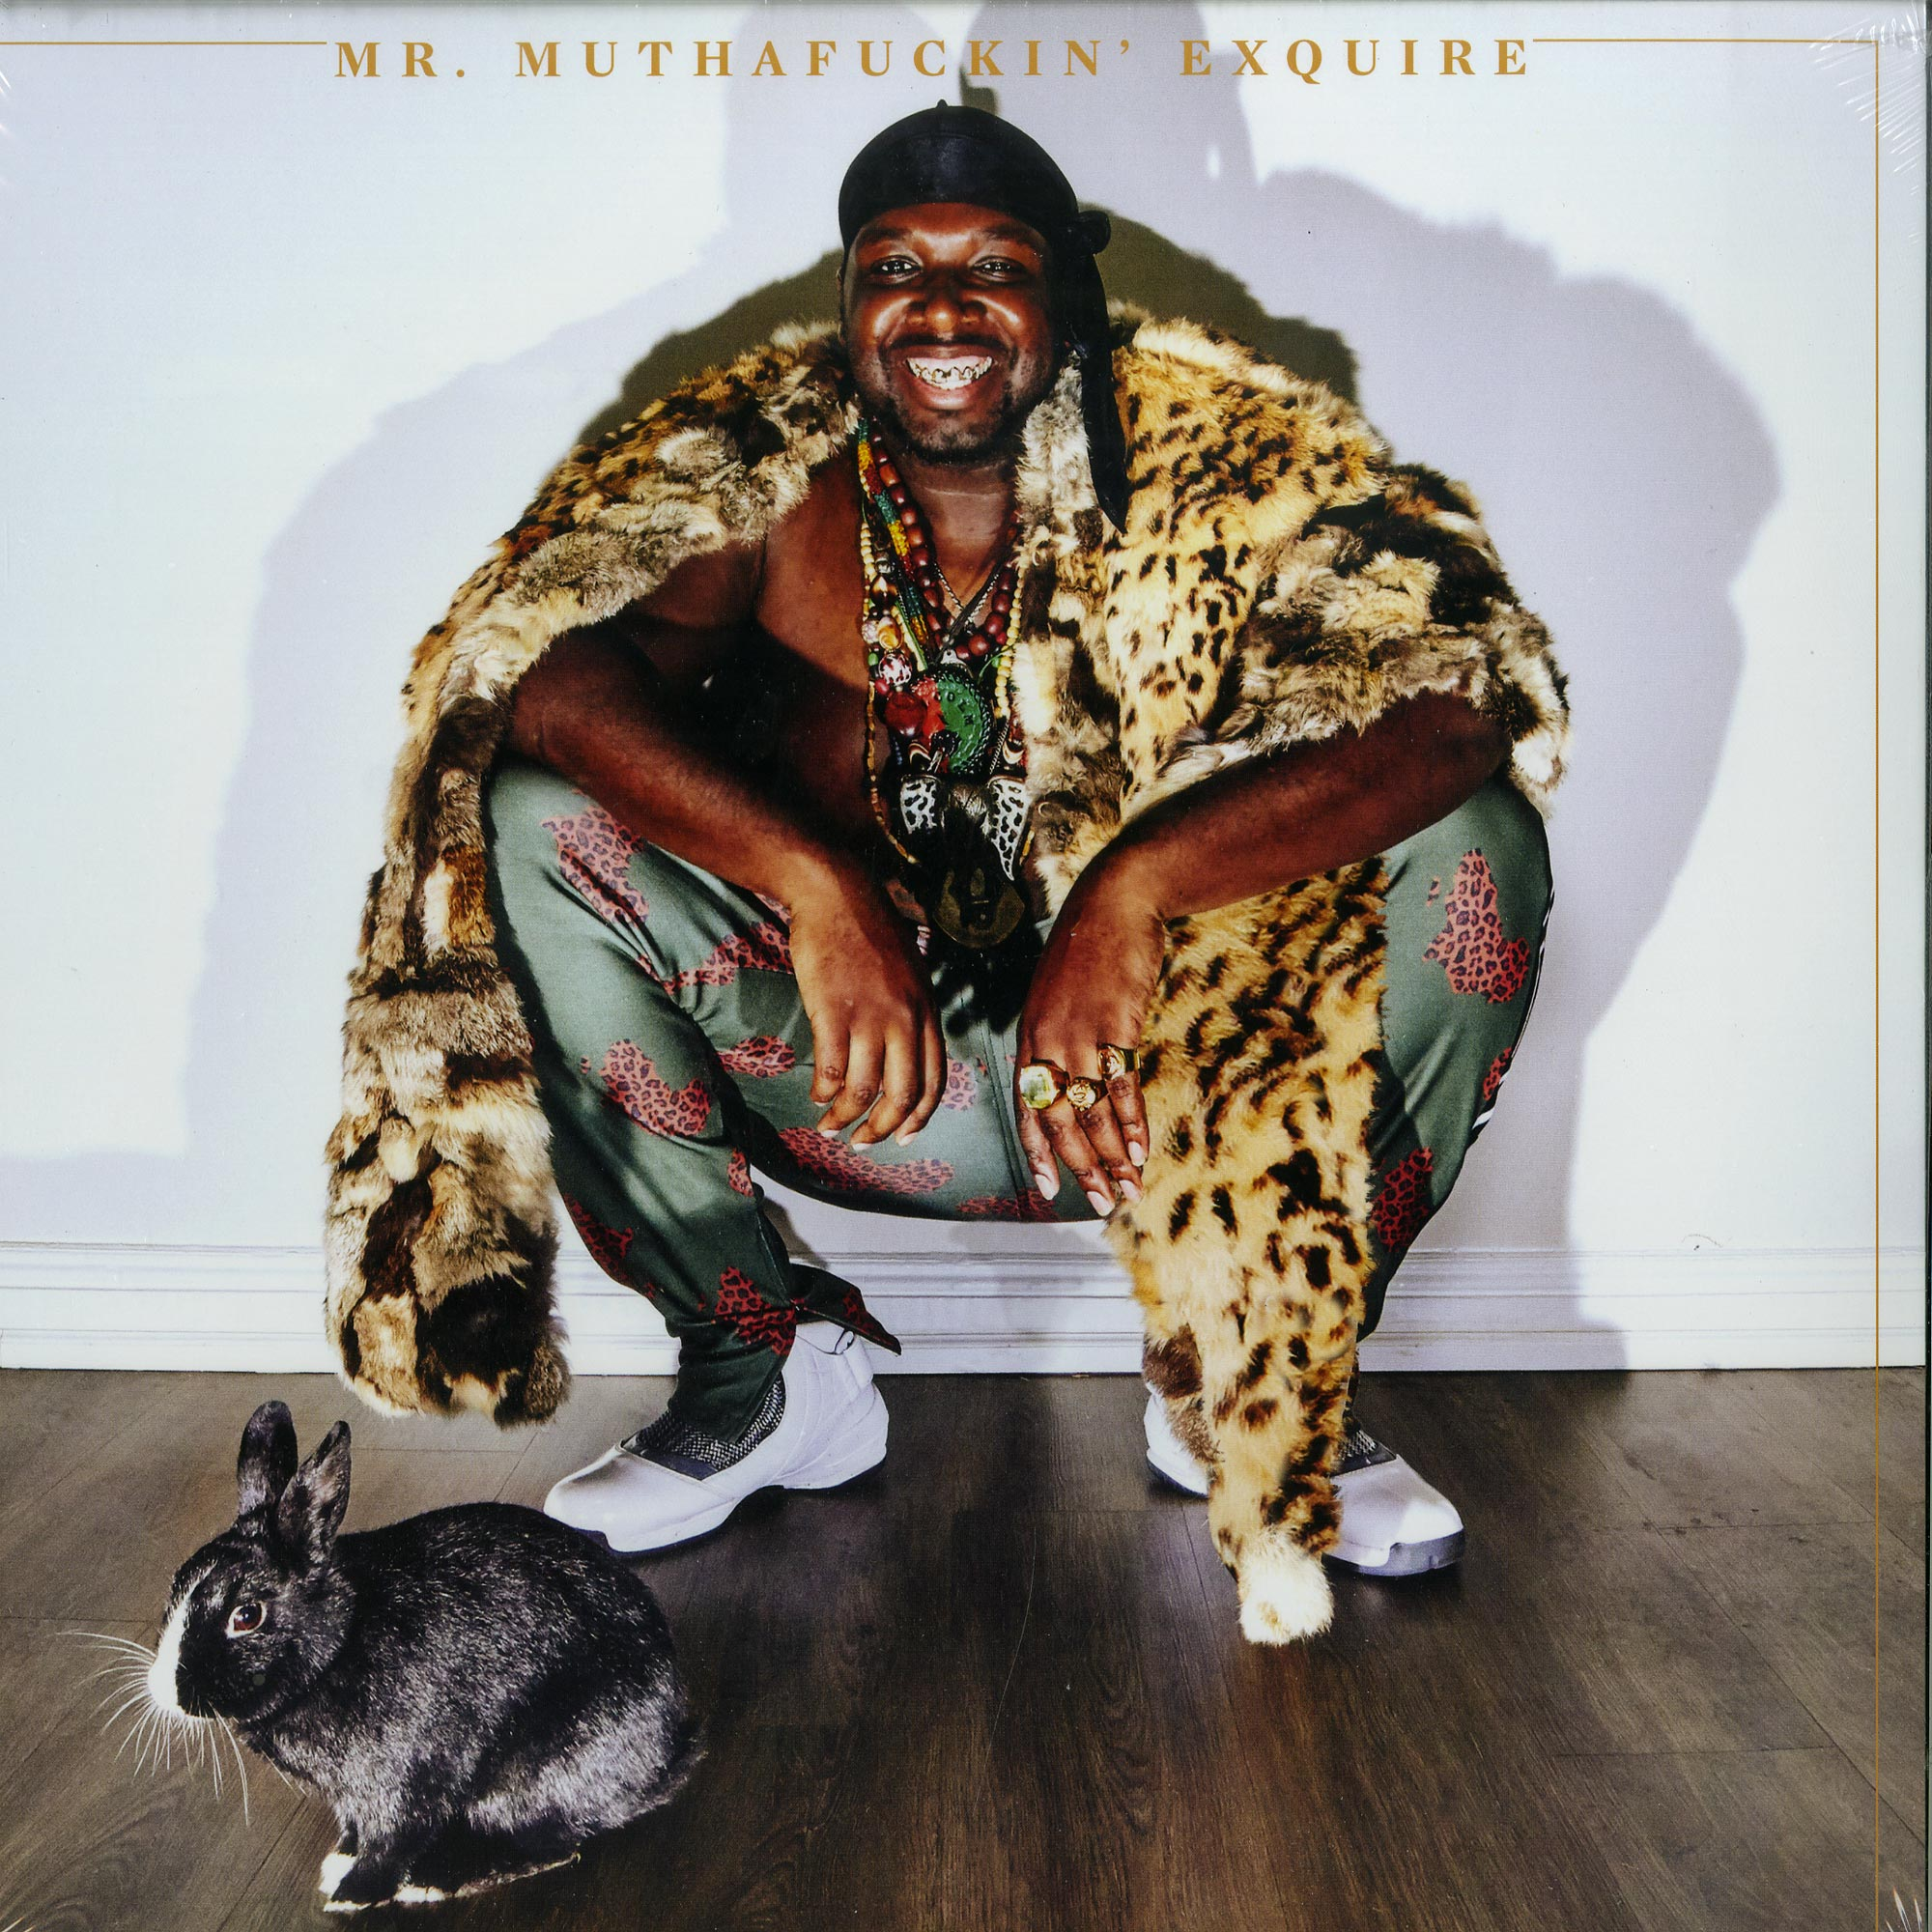 Mr. Muthafuckin Exquire - MR. MUTHAFUCKIN EXQUIRE